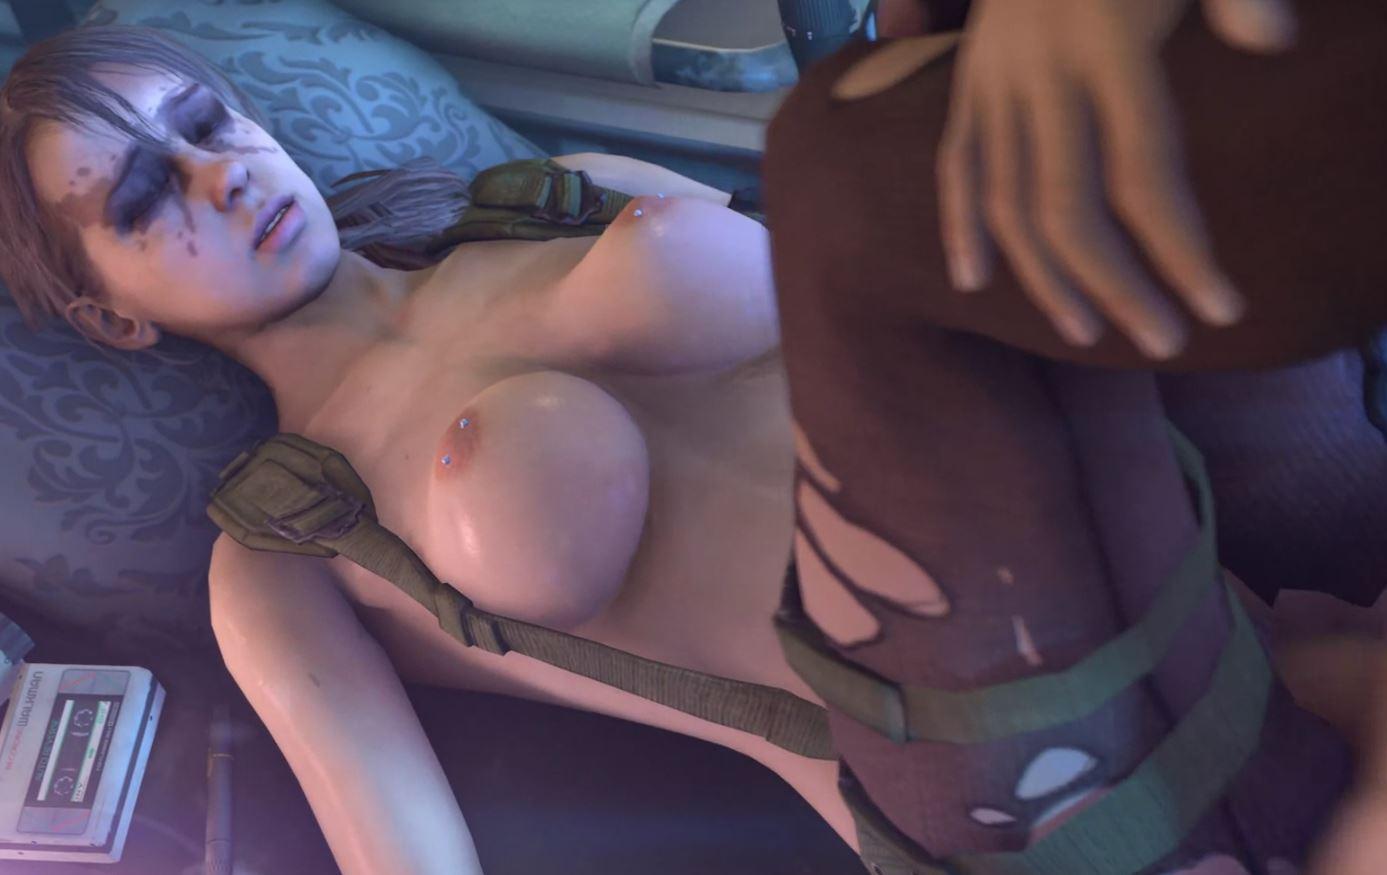 ying paladins 3d anal clip | 3d hentai club